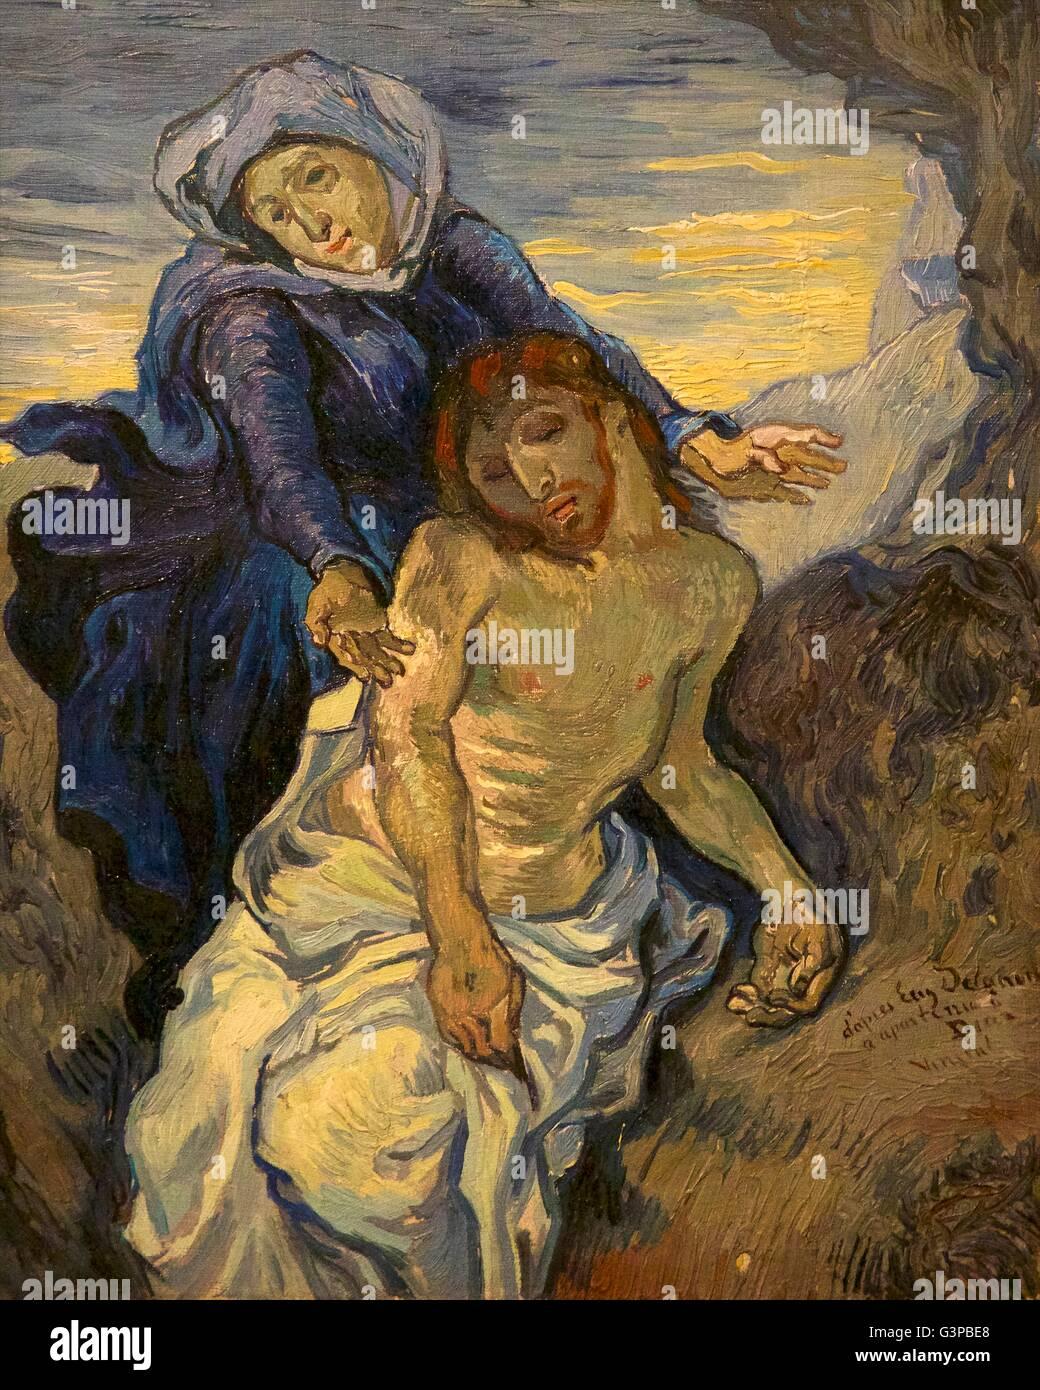 Pieta, by Vincent van Gogh, circa 1890,  Vatican Museums, Rome, Italy - Stock Image